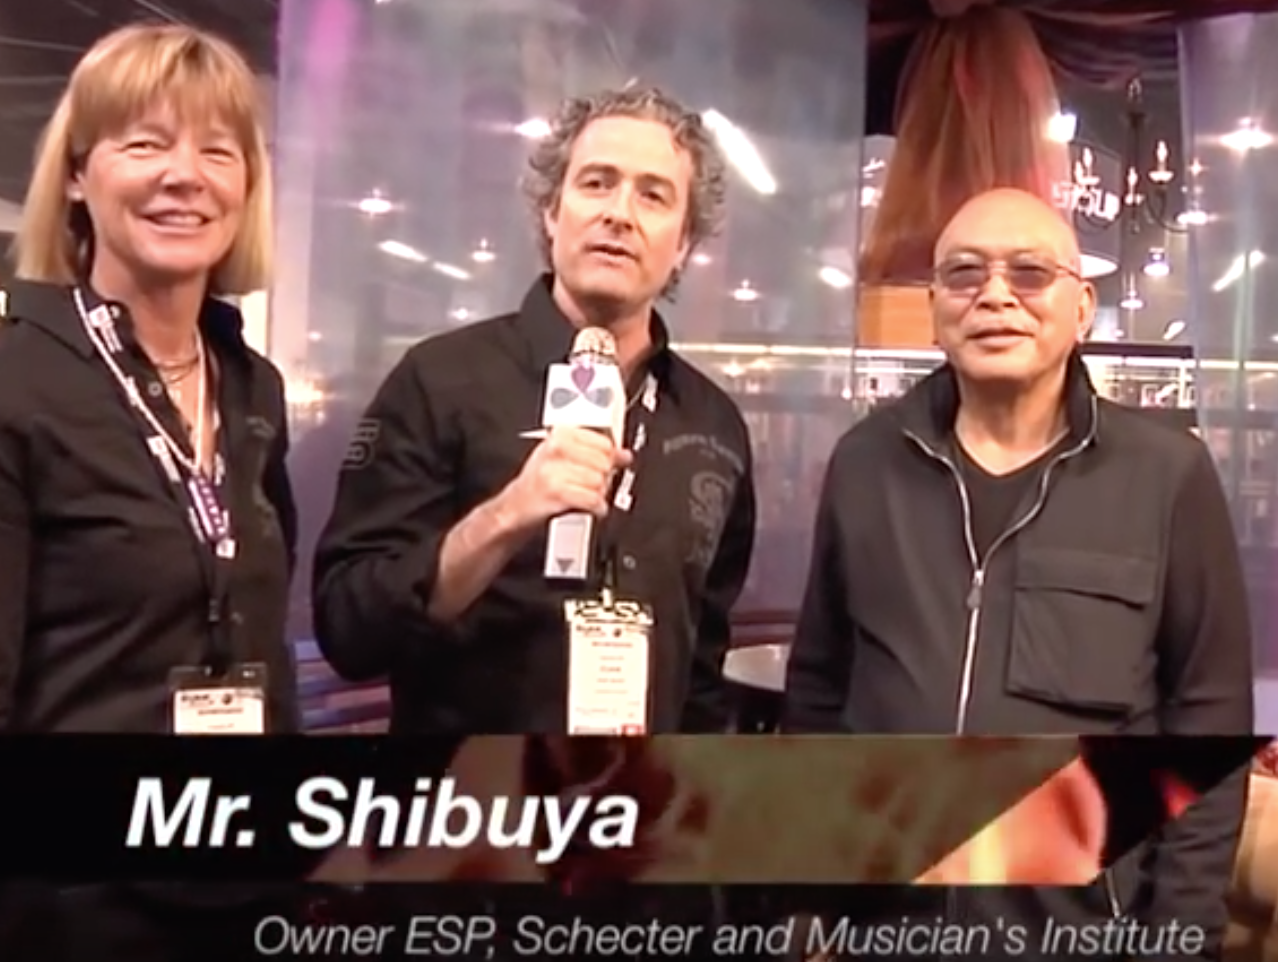 Hisatake Shibuya entrevistado en el 2011 por Evan Skopp, Presidente Inside Track International (link del video: https://www.youtube.com/watch?v=lQ3aAdC3l5M)